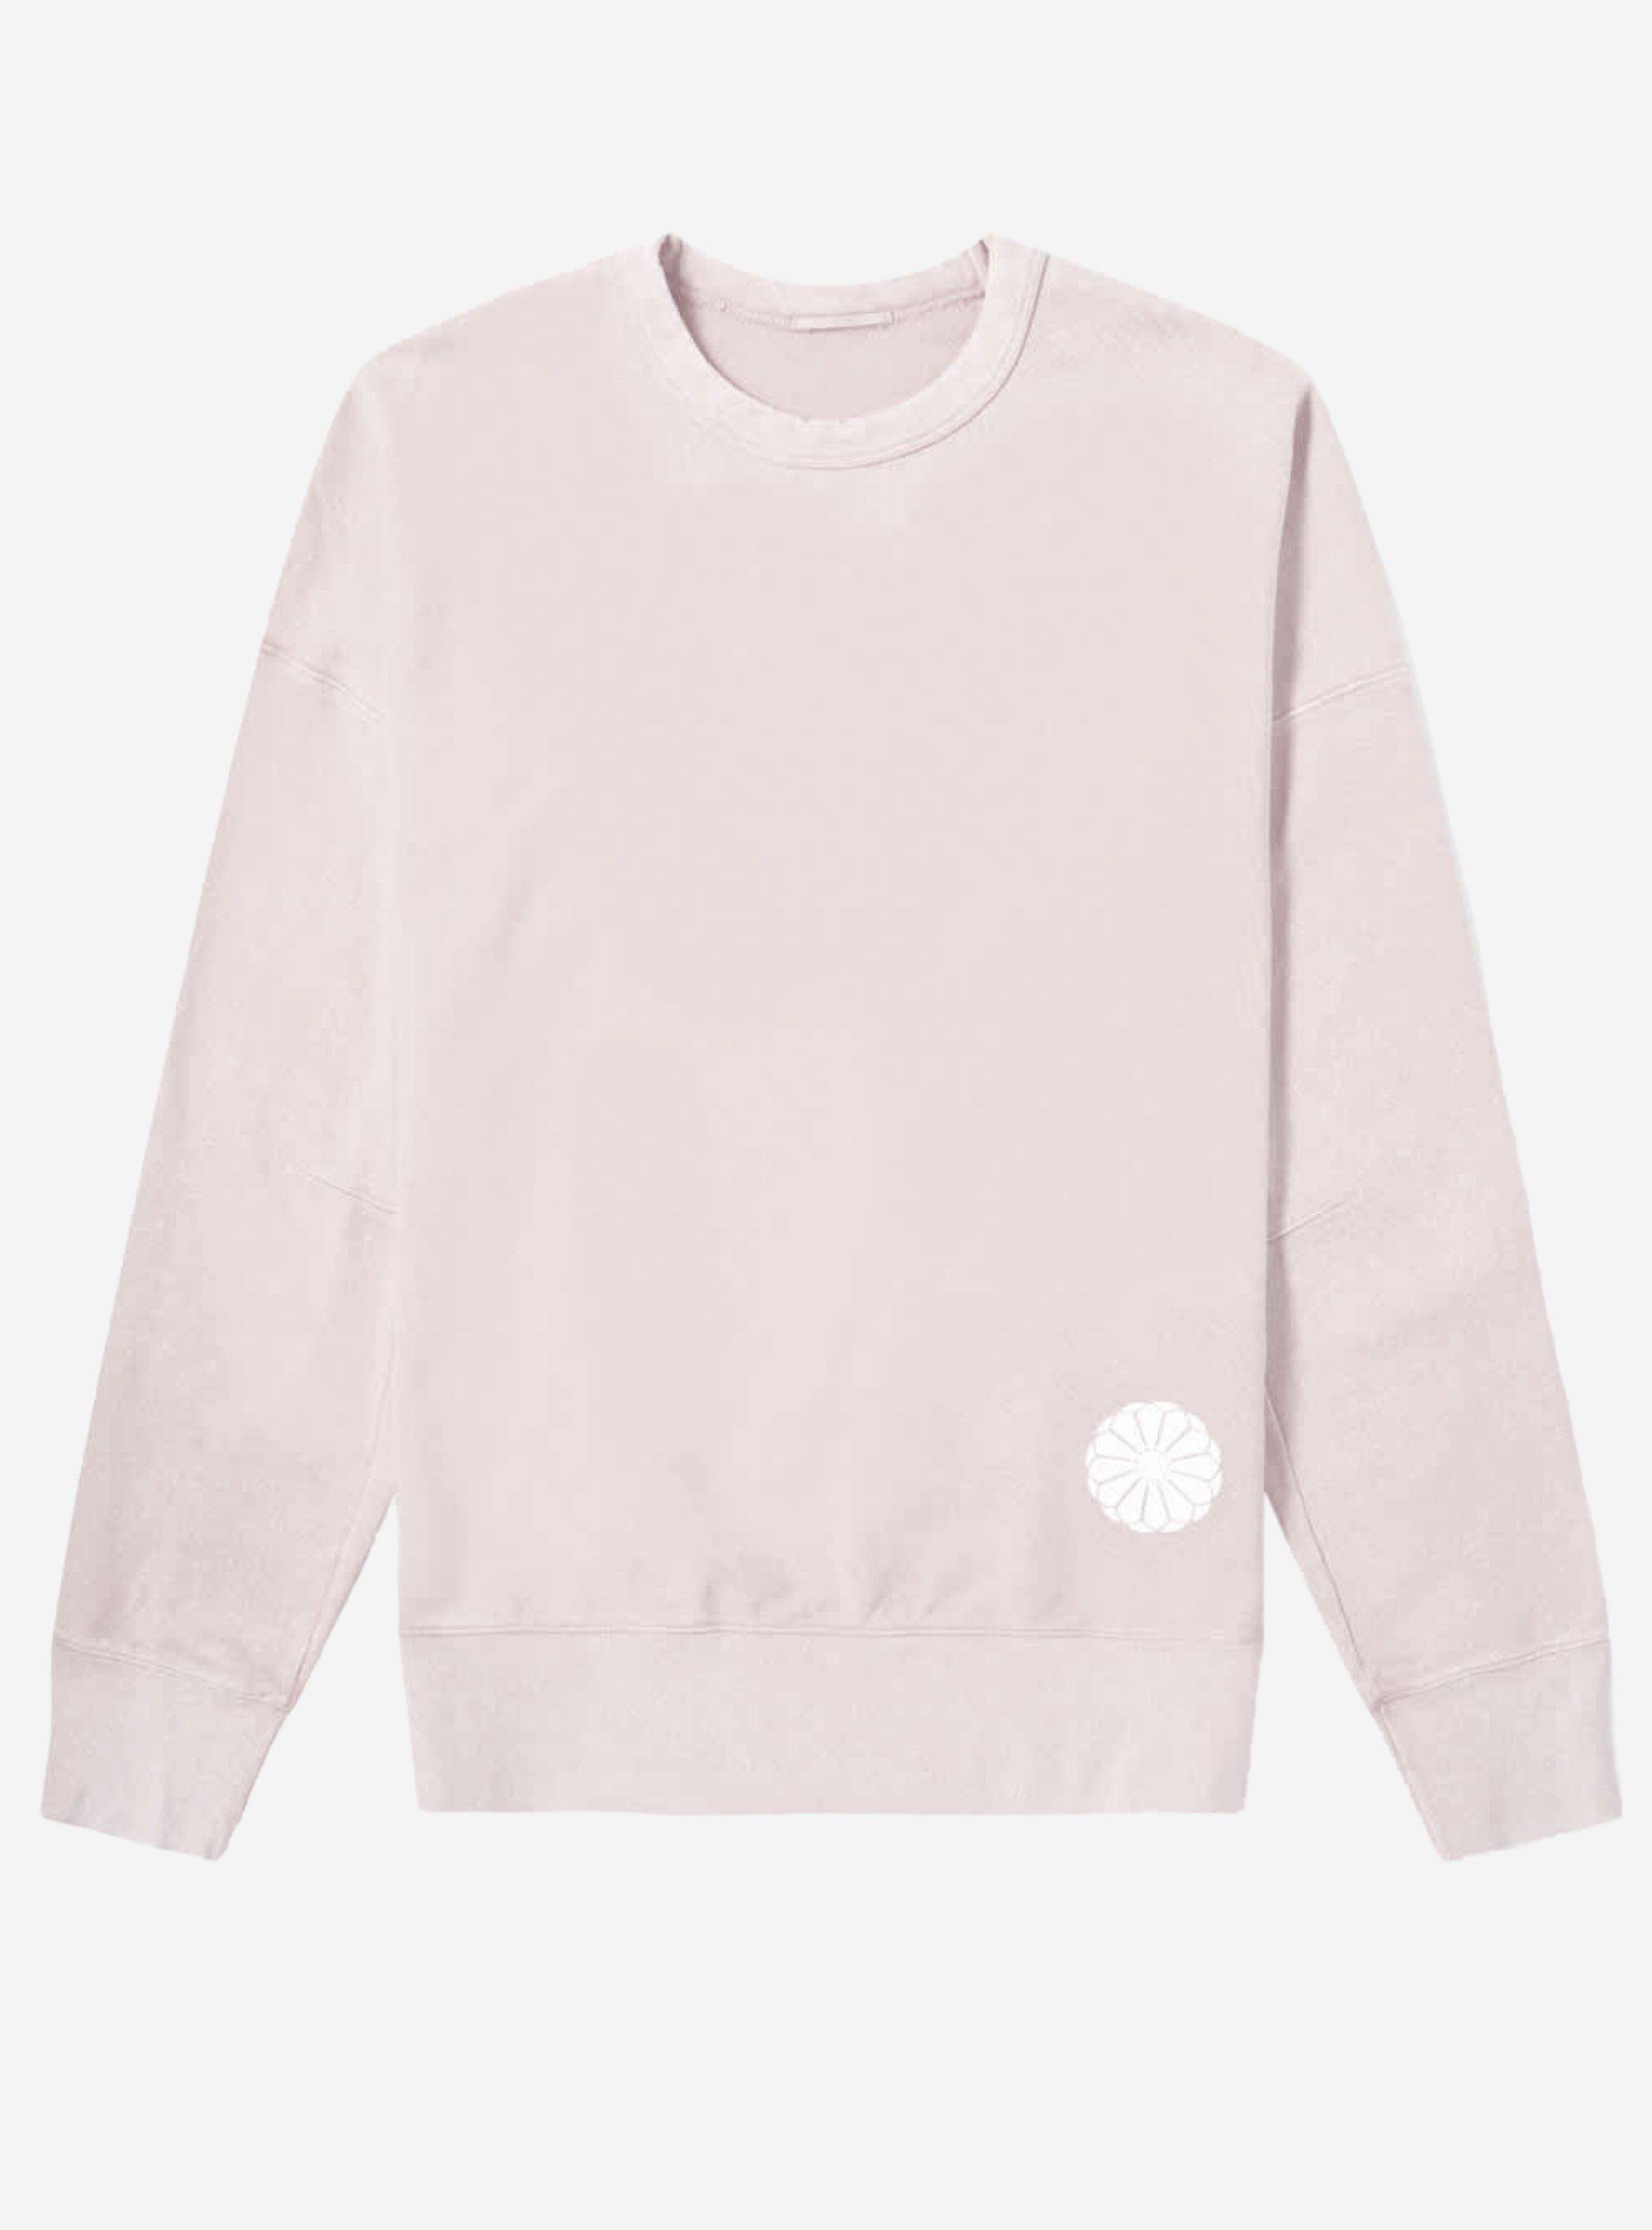 TEN C - LOGO PATCH SWEAT - Mauve Pink - TEN C